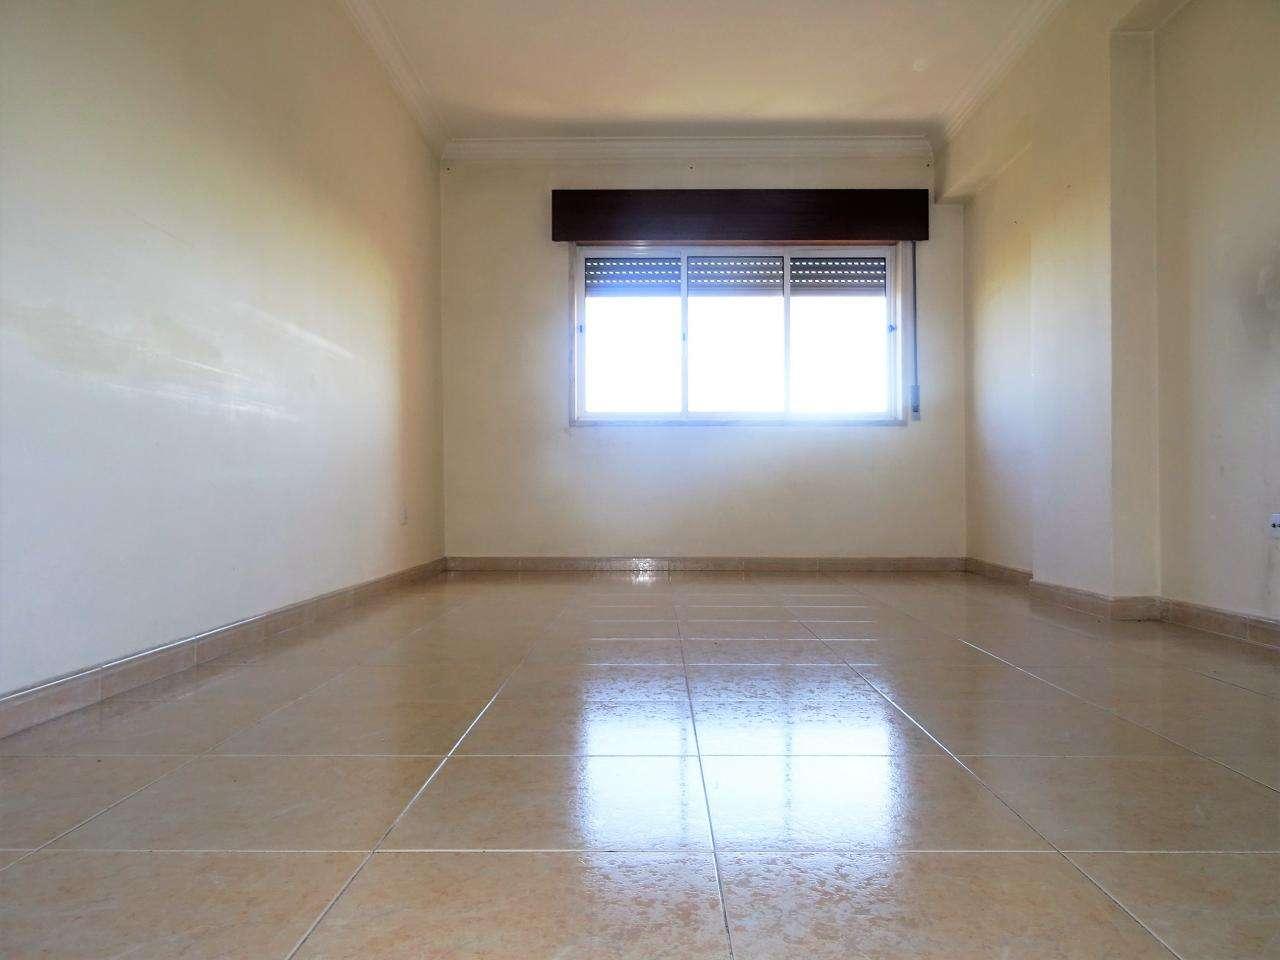 Apartamento para comprar, Porto Salvo, Oeiras, Lisboa - Foto 6